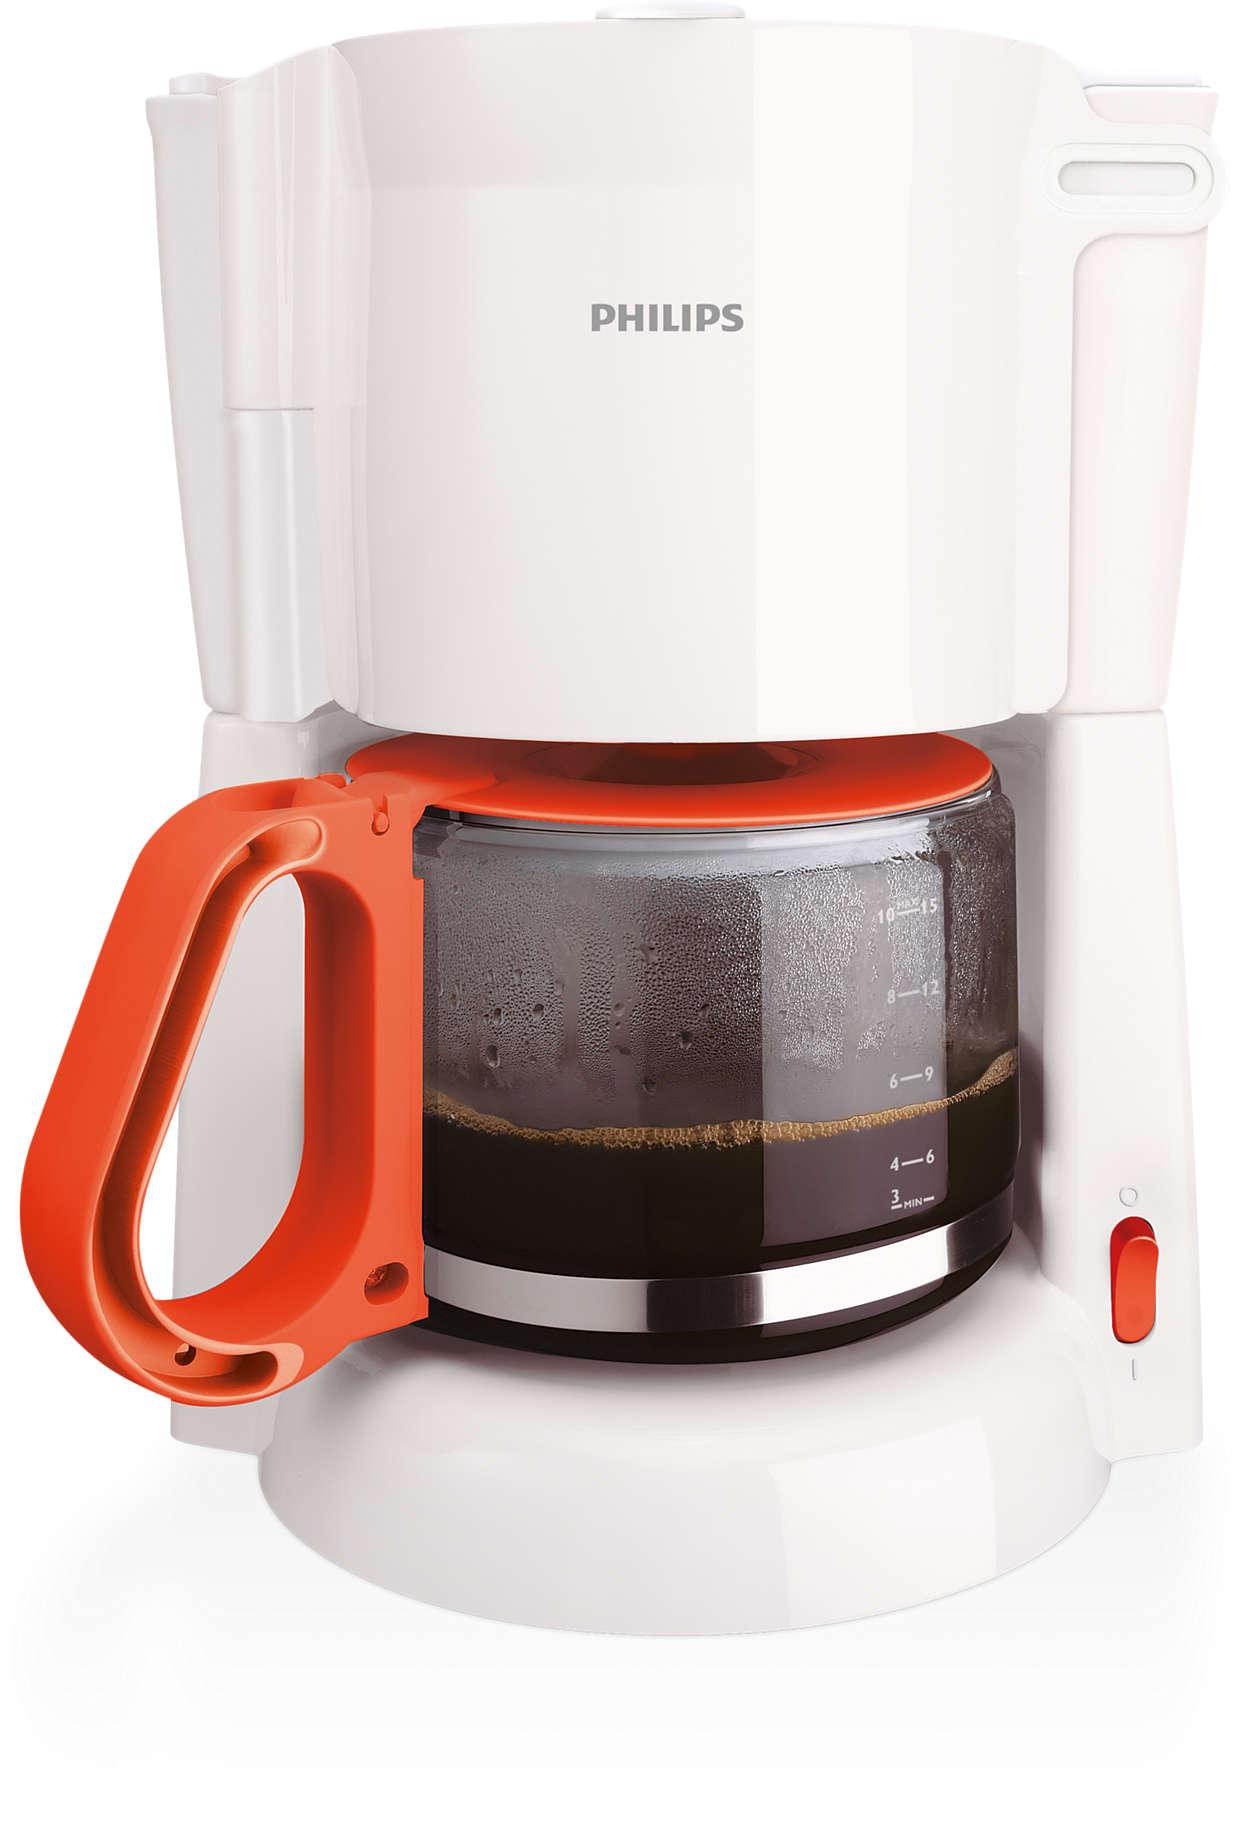 Guter Kaffee - Einfach gemacht